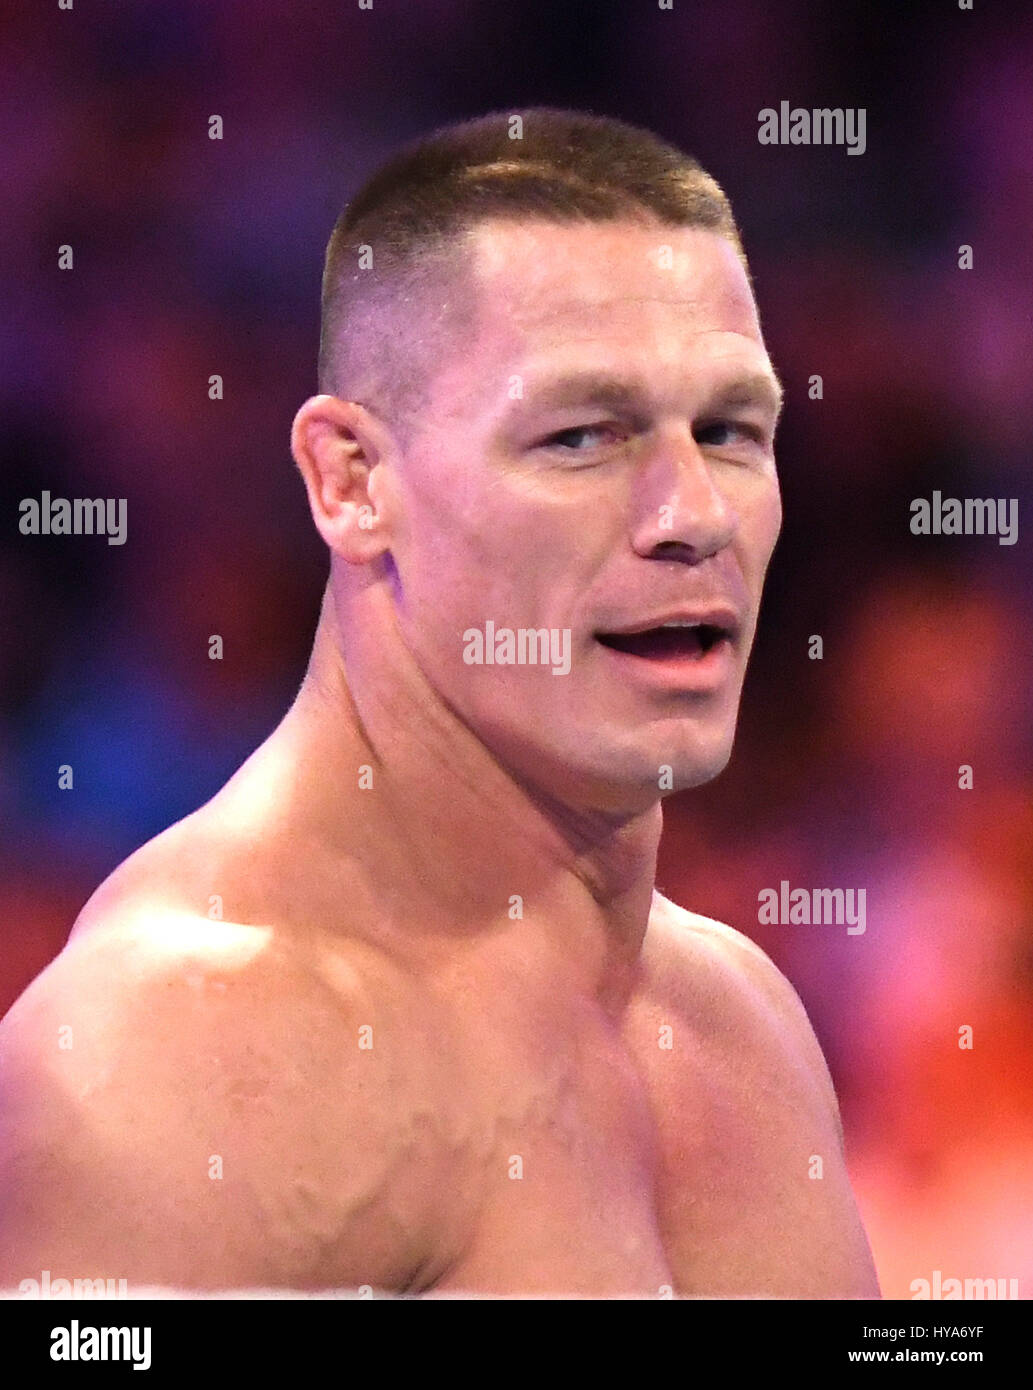 John Cena at WWE's WrestleMania